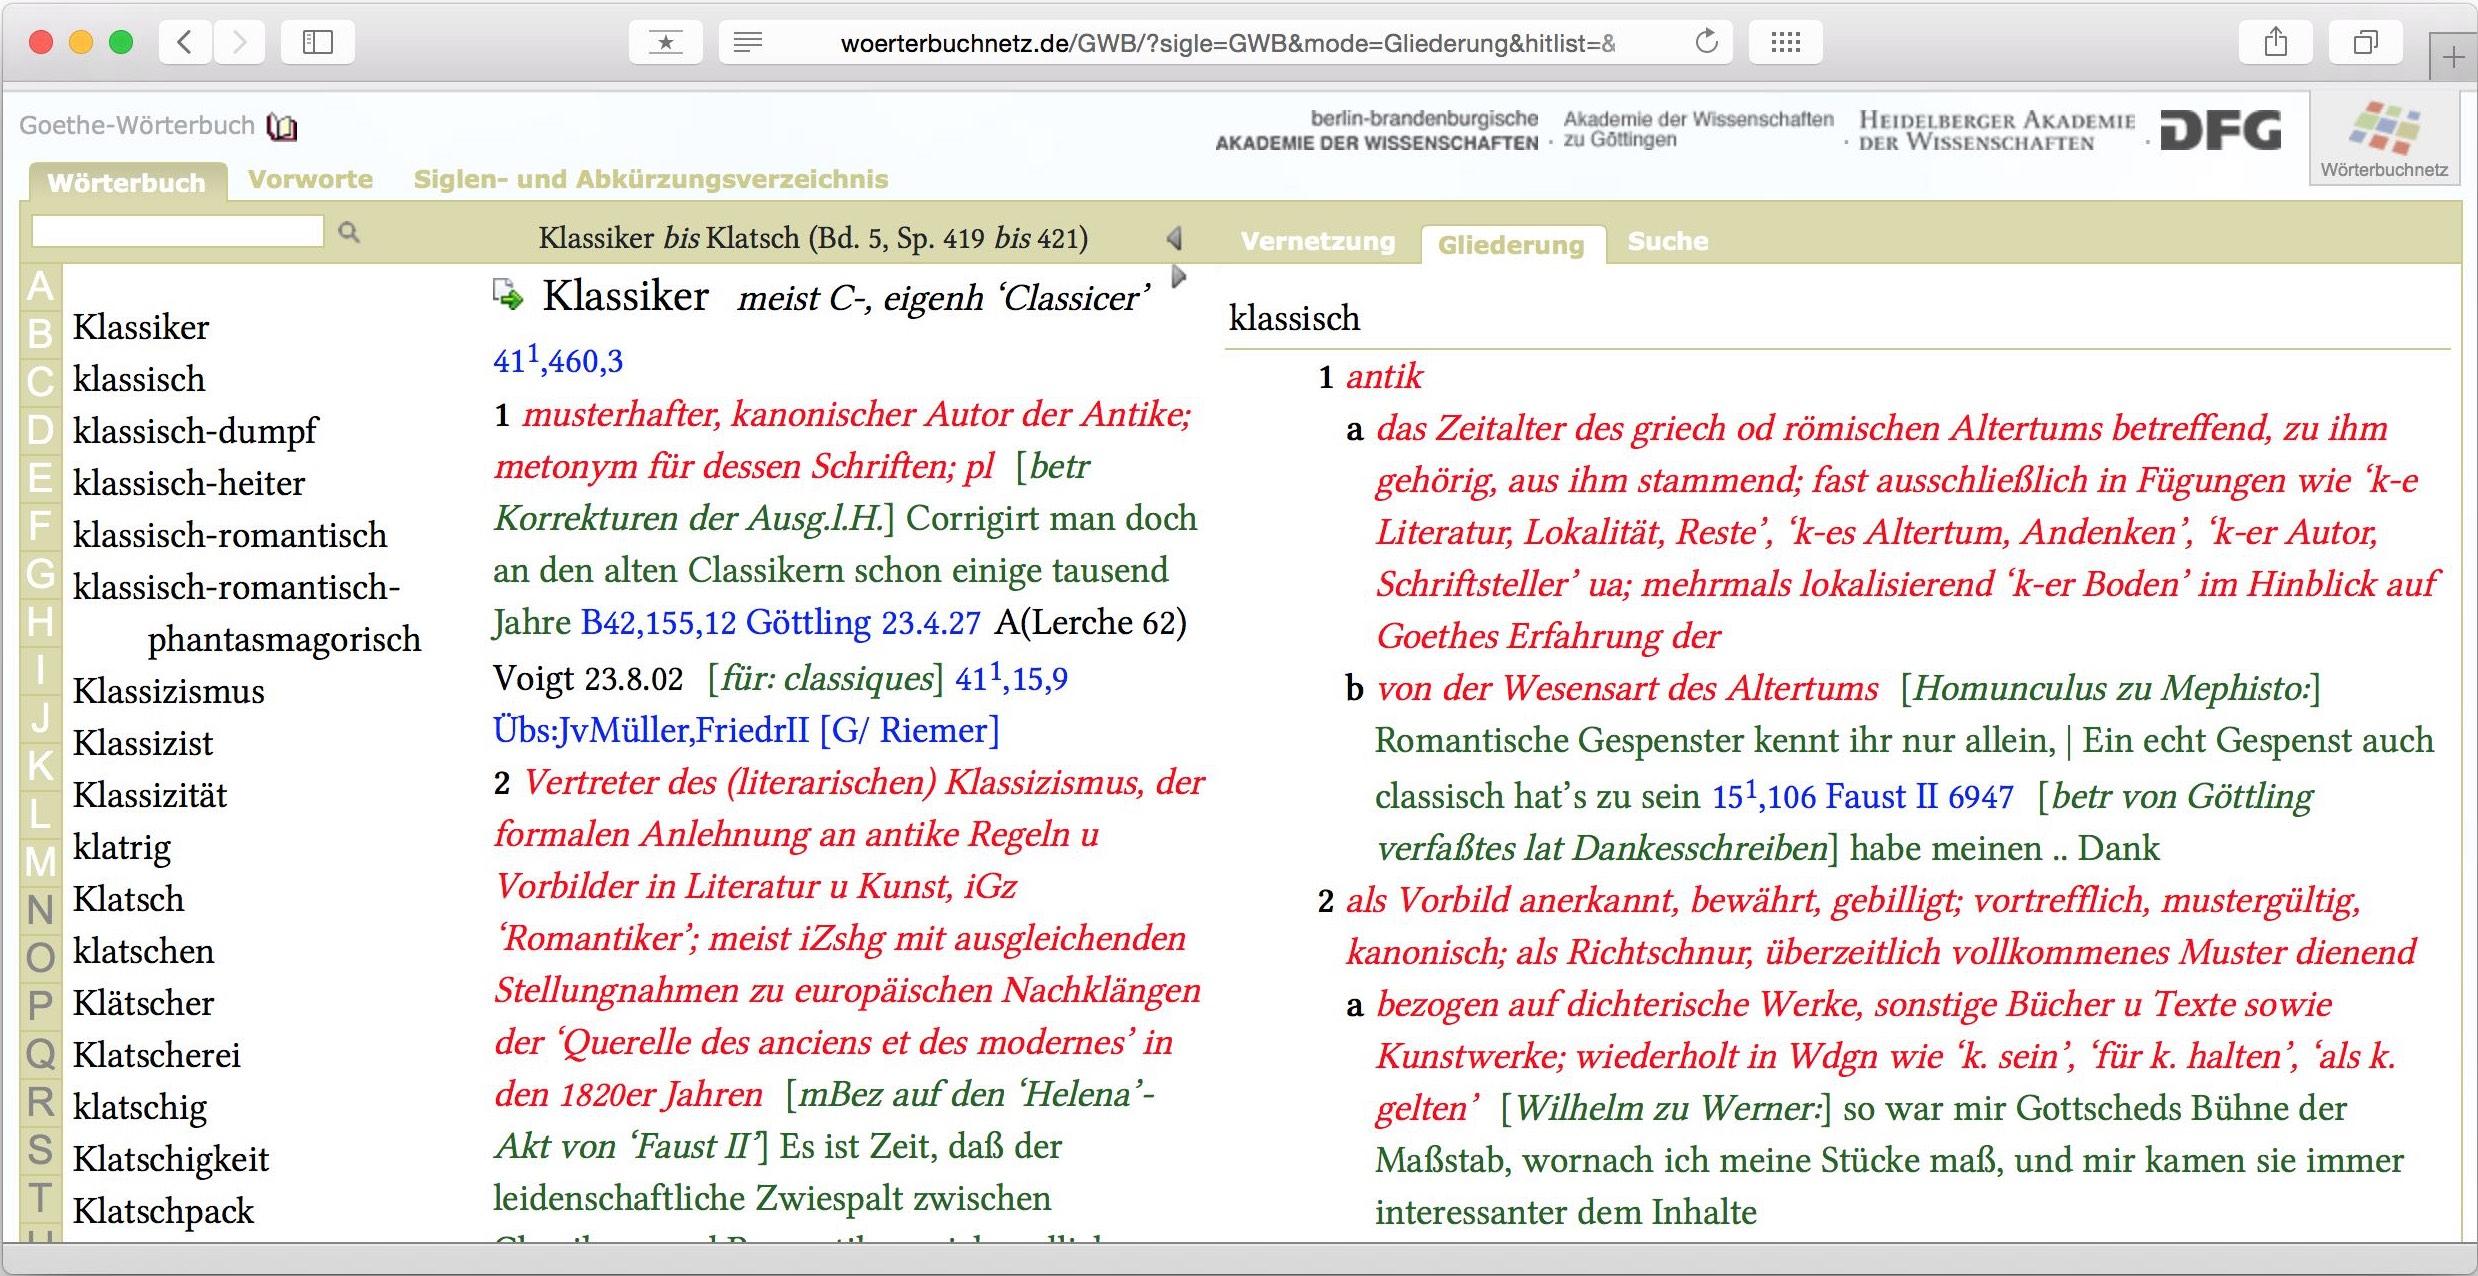 Goethe Wörterbuch: Klassiker y klassisch